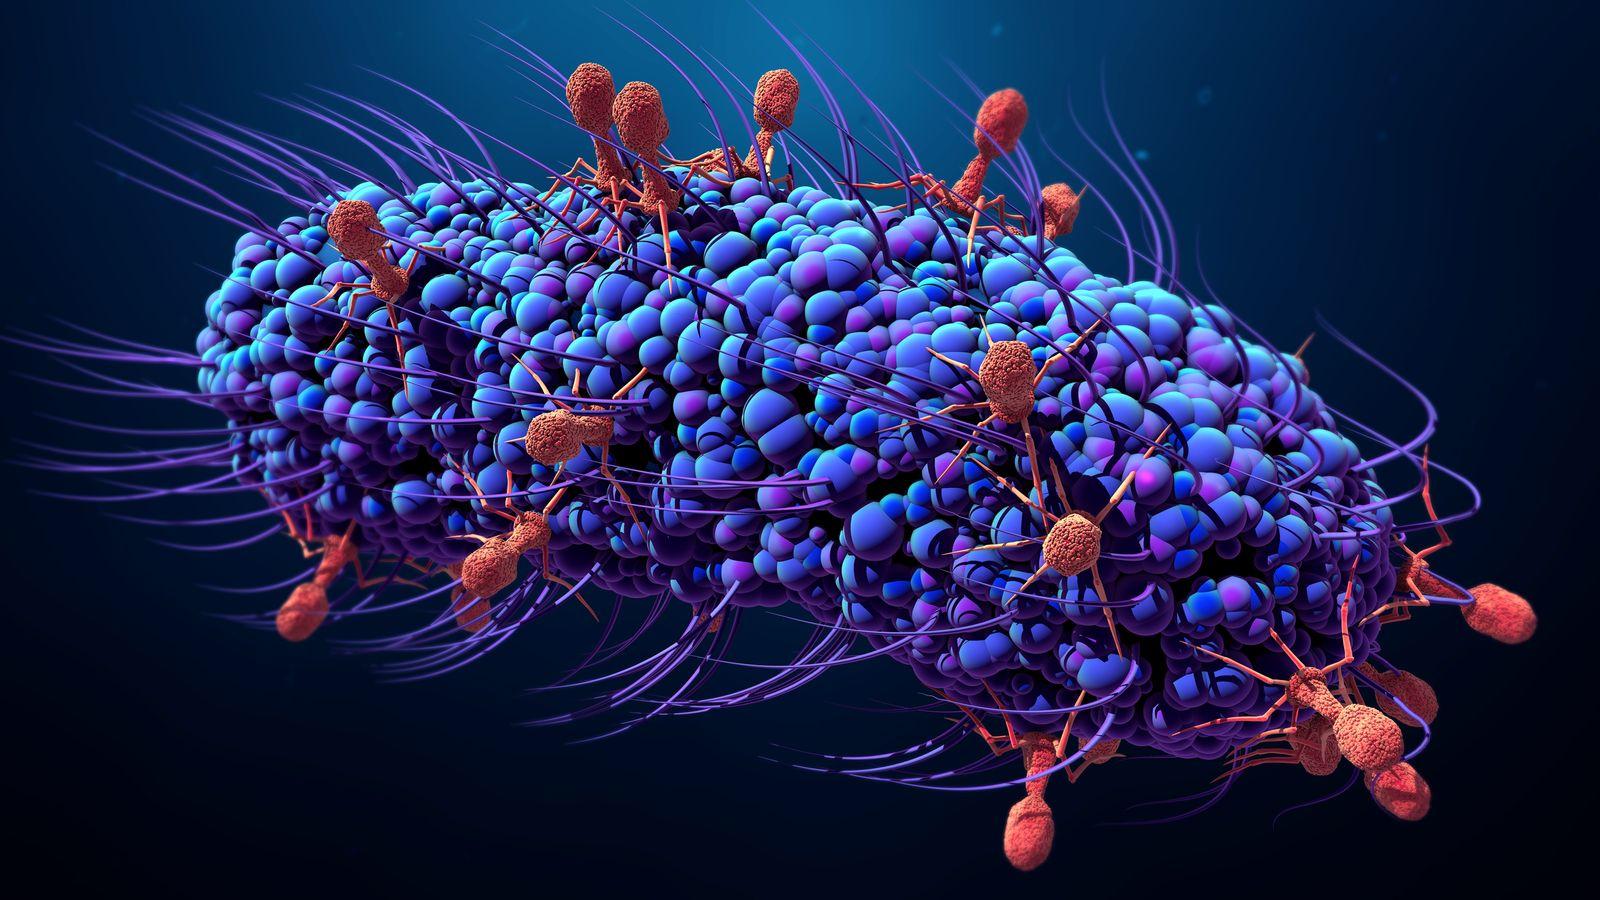 Bakteriophagen